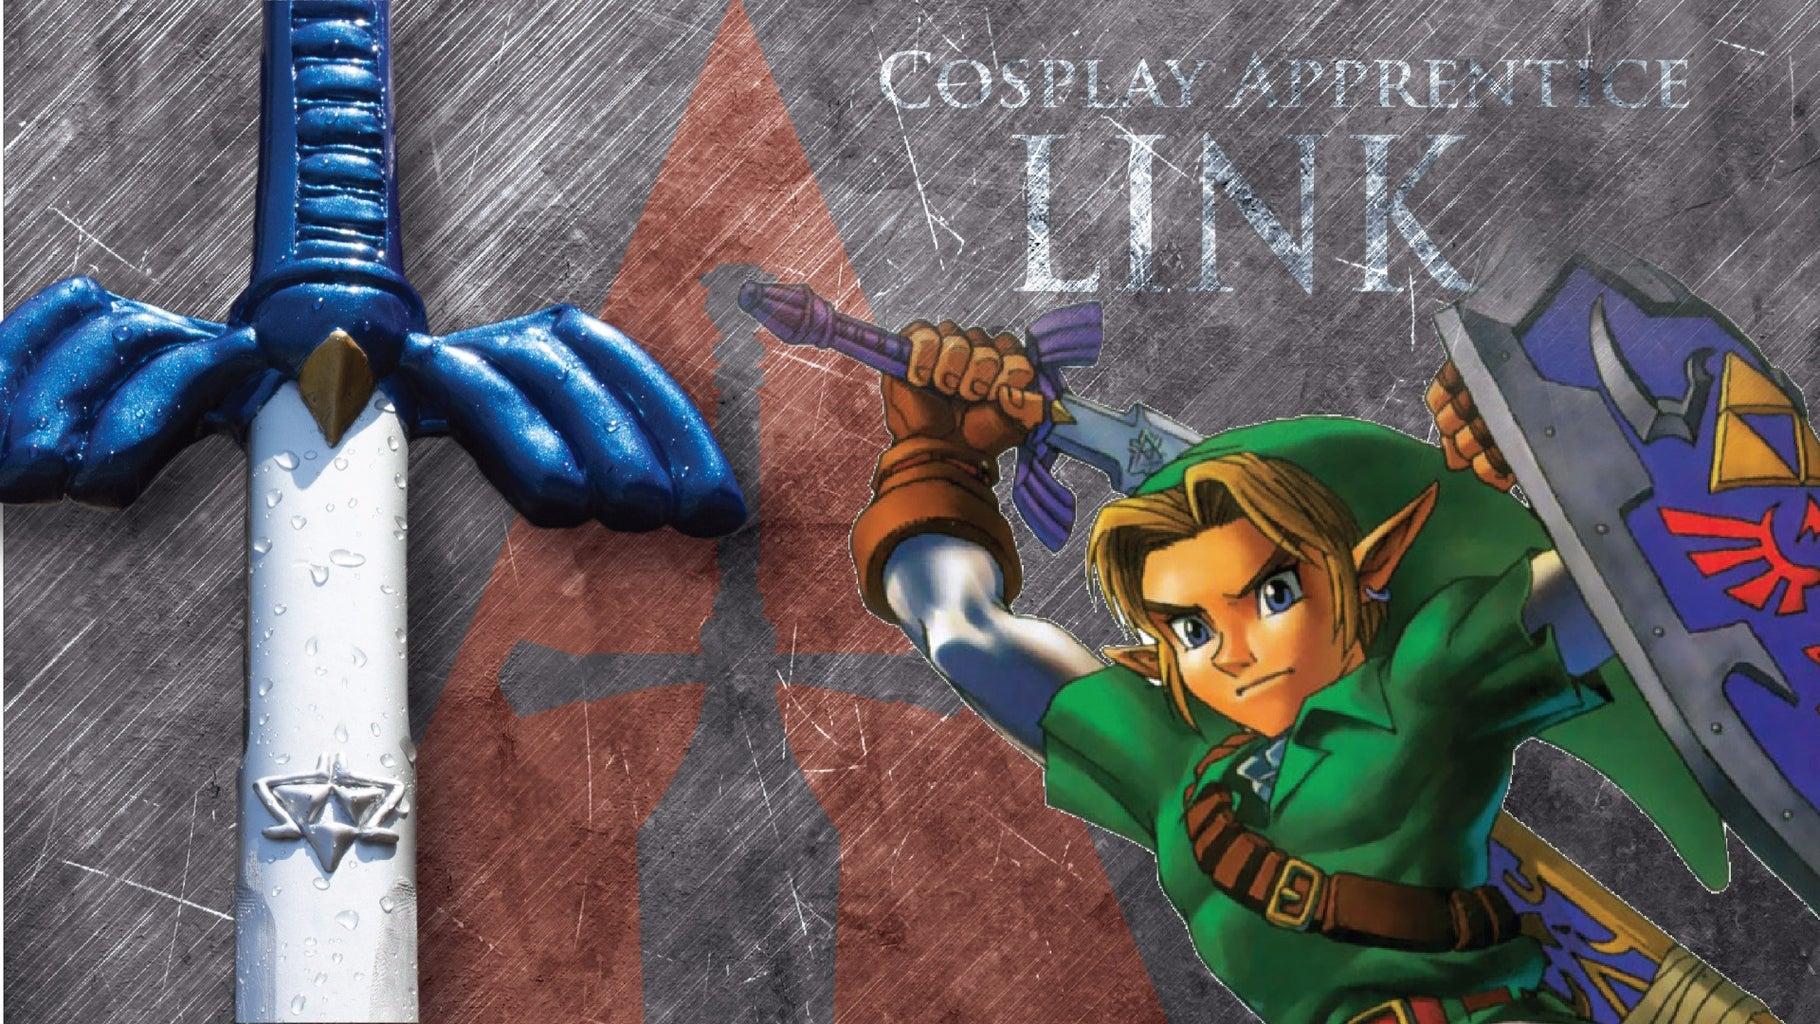 How to Make the Master Sword - Zelda: Ocarina of Time